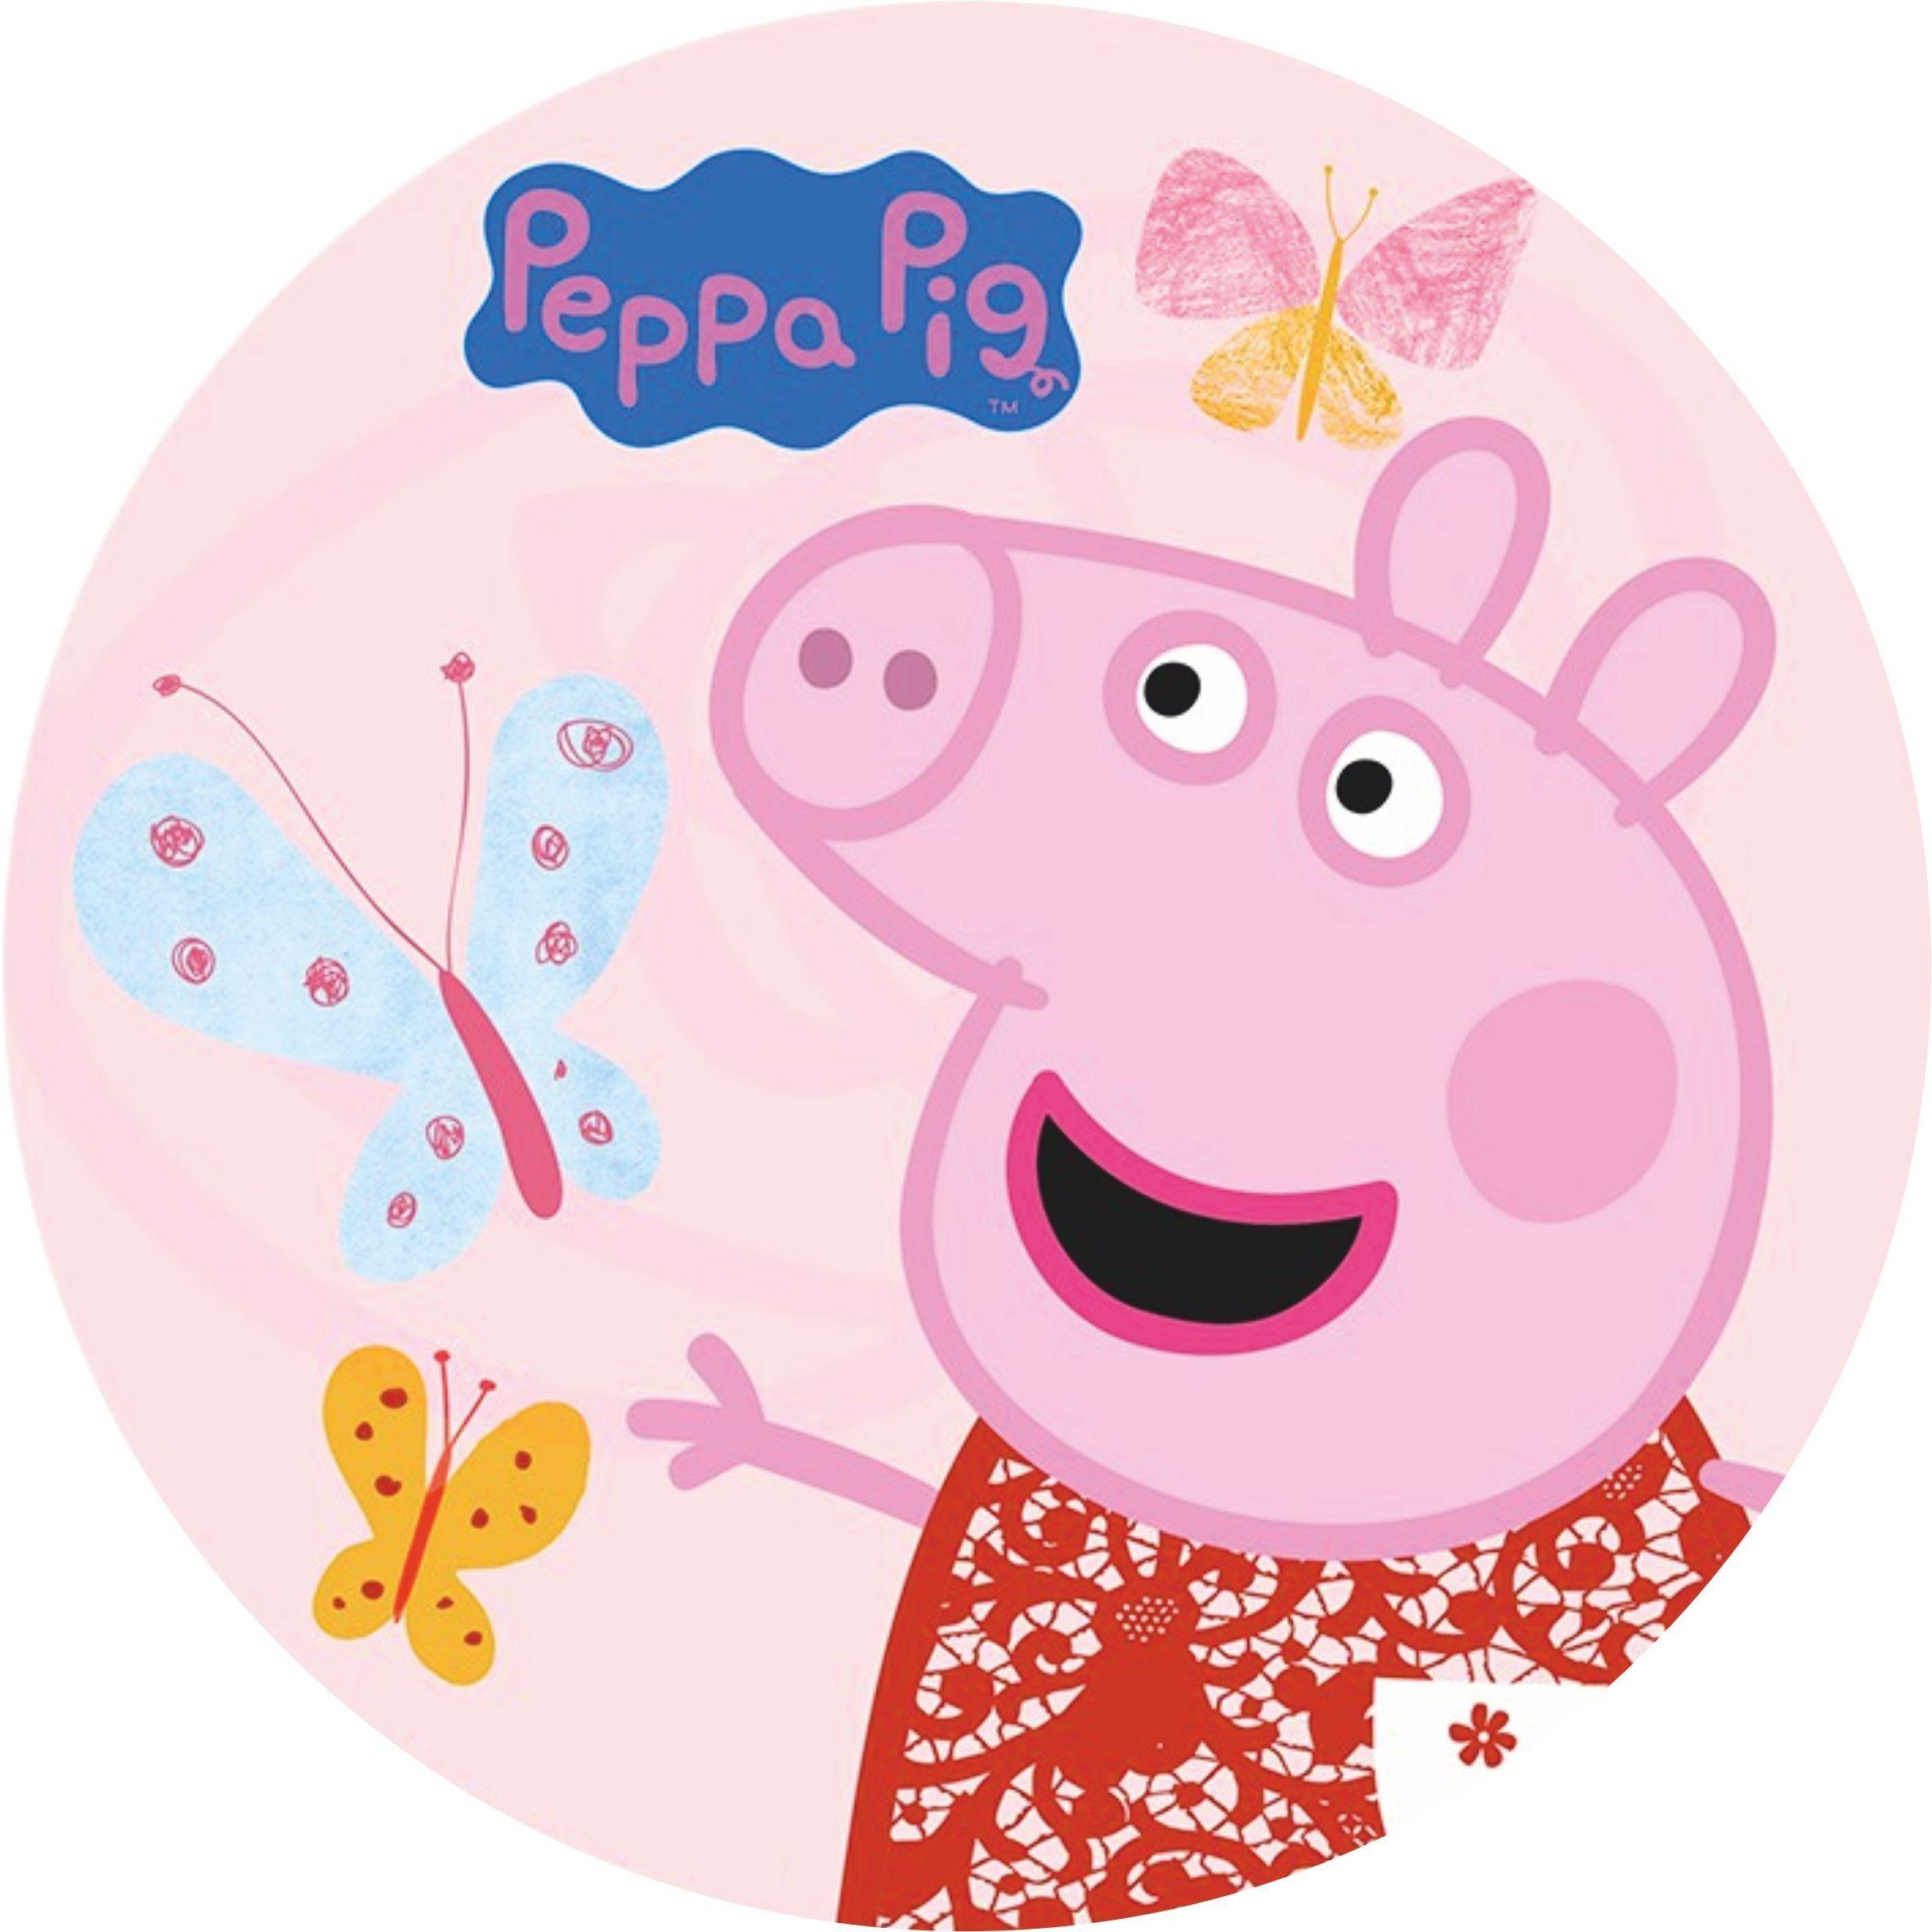 Graffiti Stickers For Walls Sticker De Peppa Pig Para Imprimir Kamos Sticker